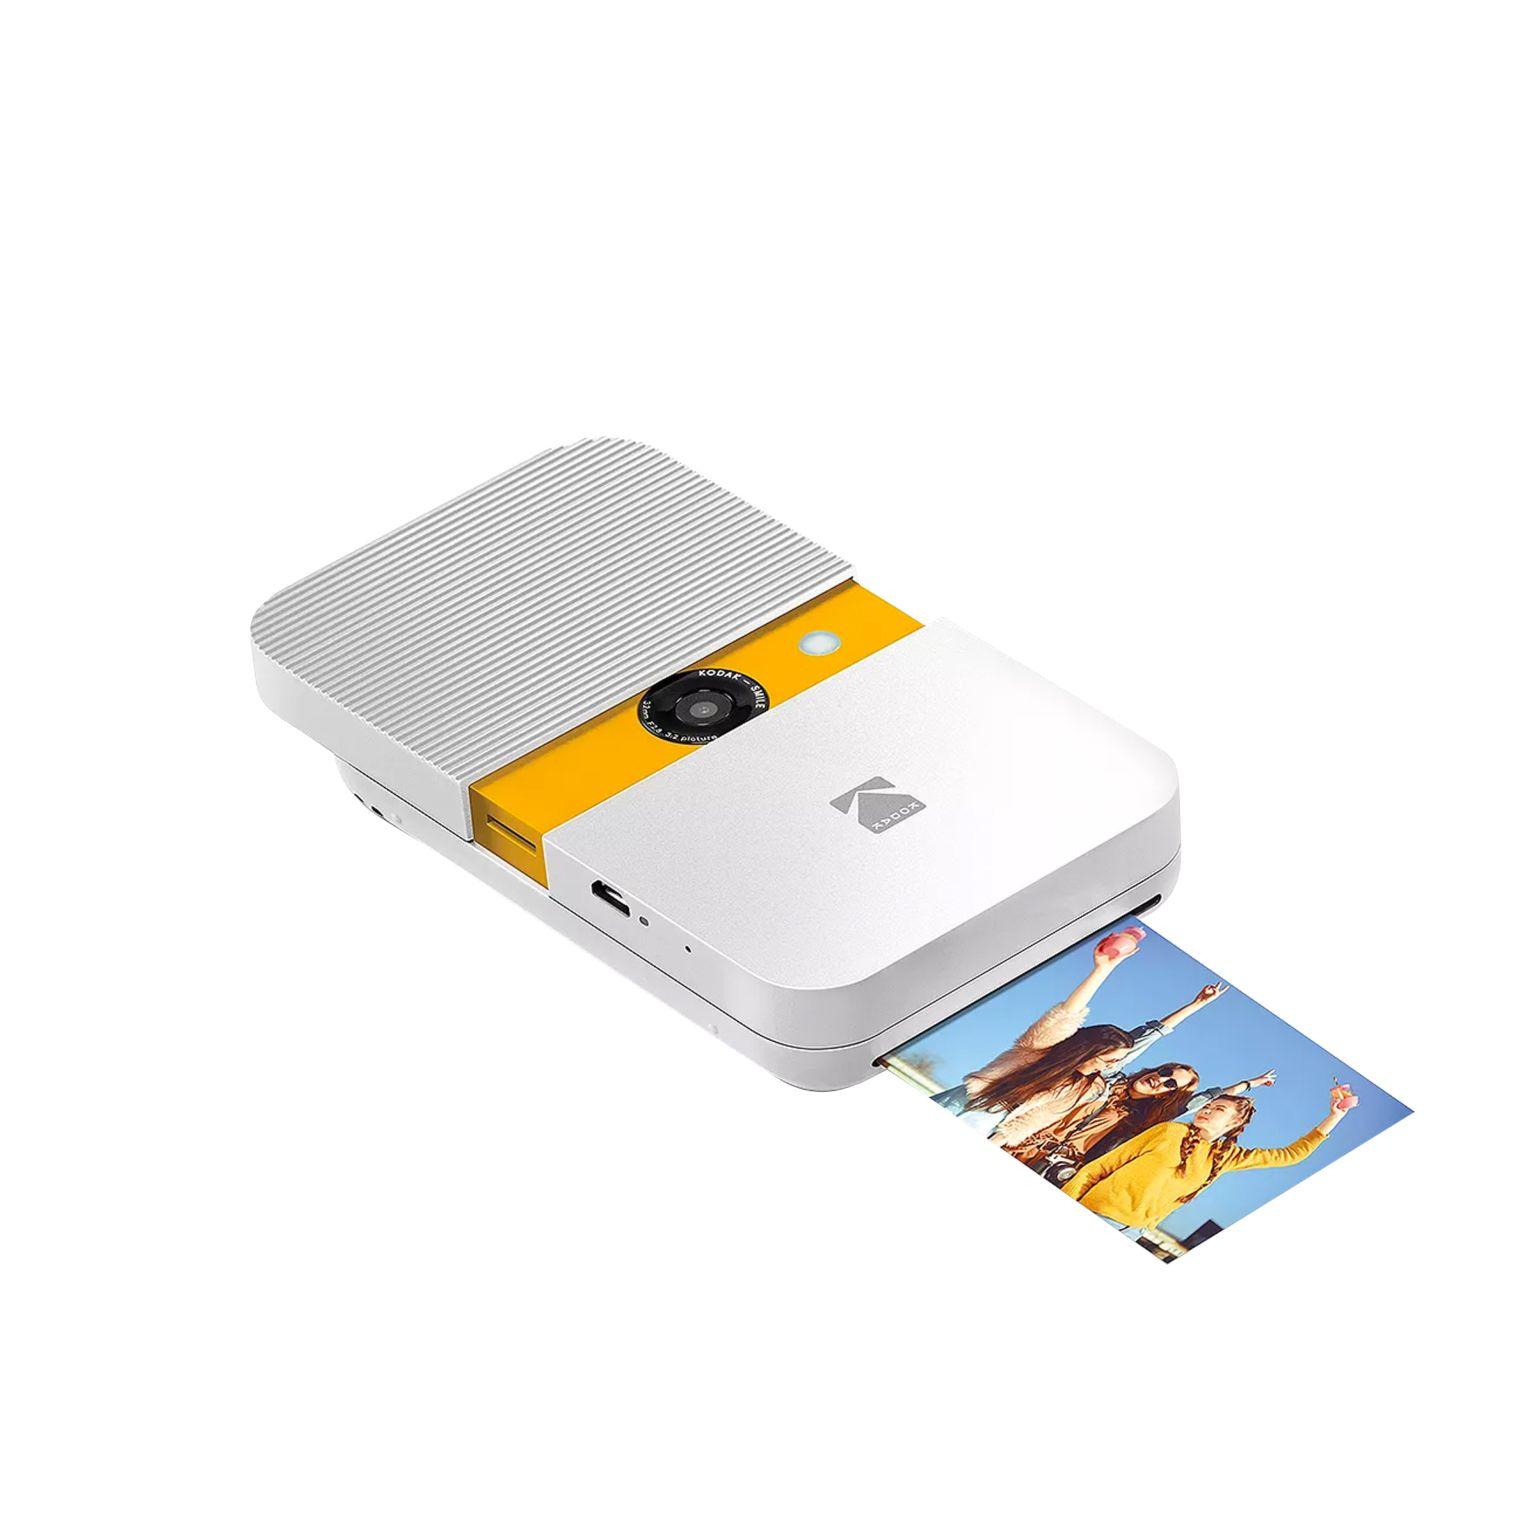 Kodak Smile Instant Print Digital Camera No personalization Blanc